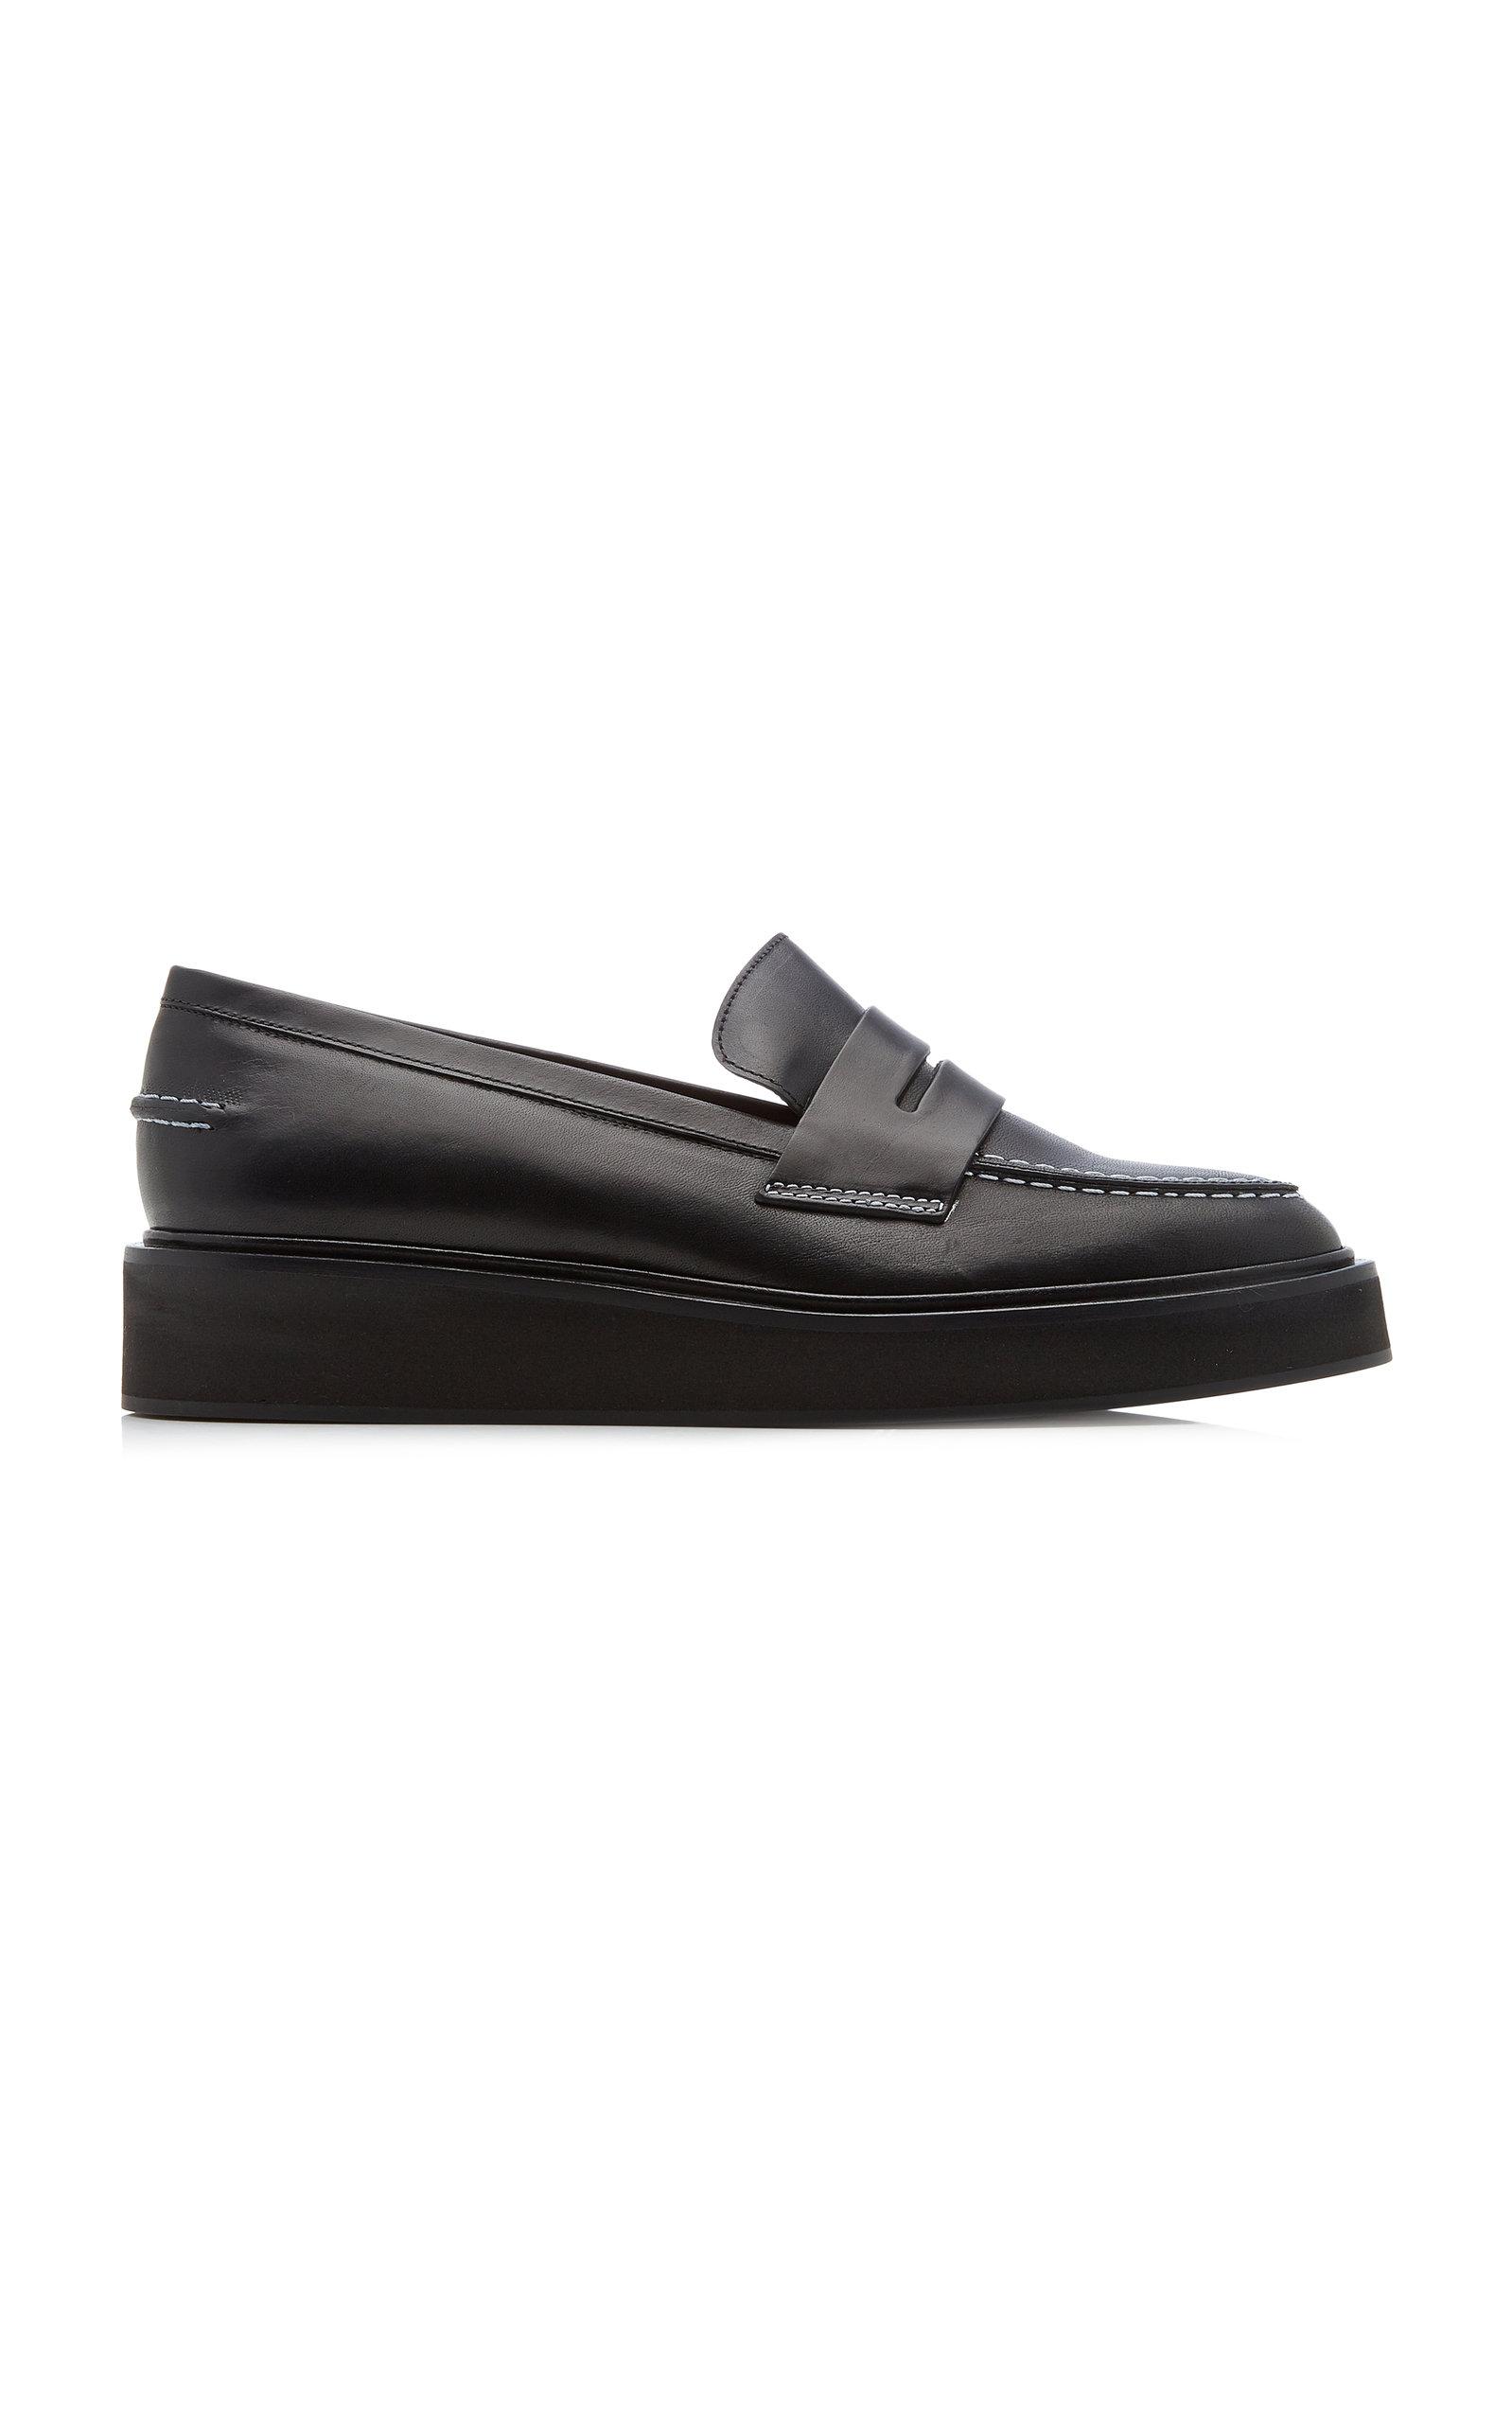 Women's Monsano Leather Loafers